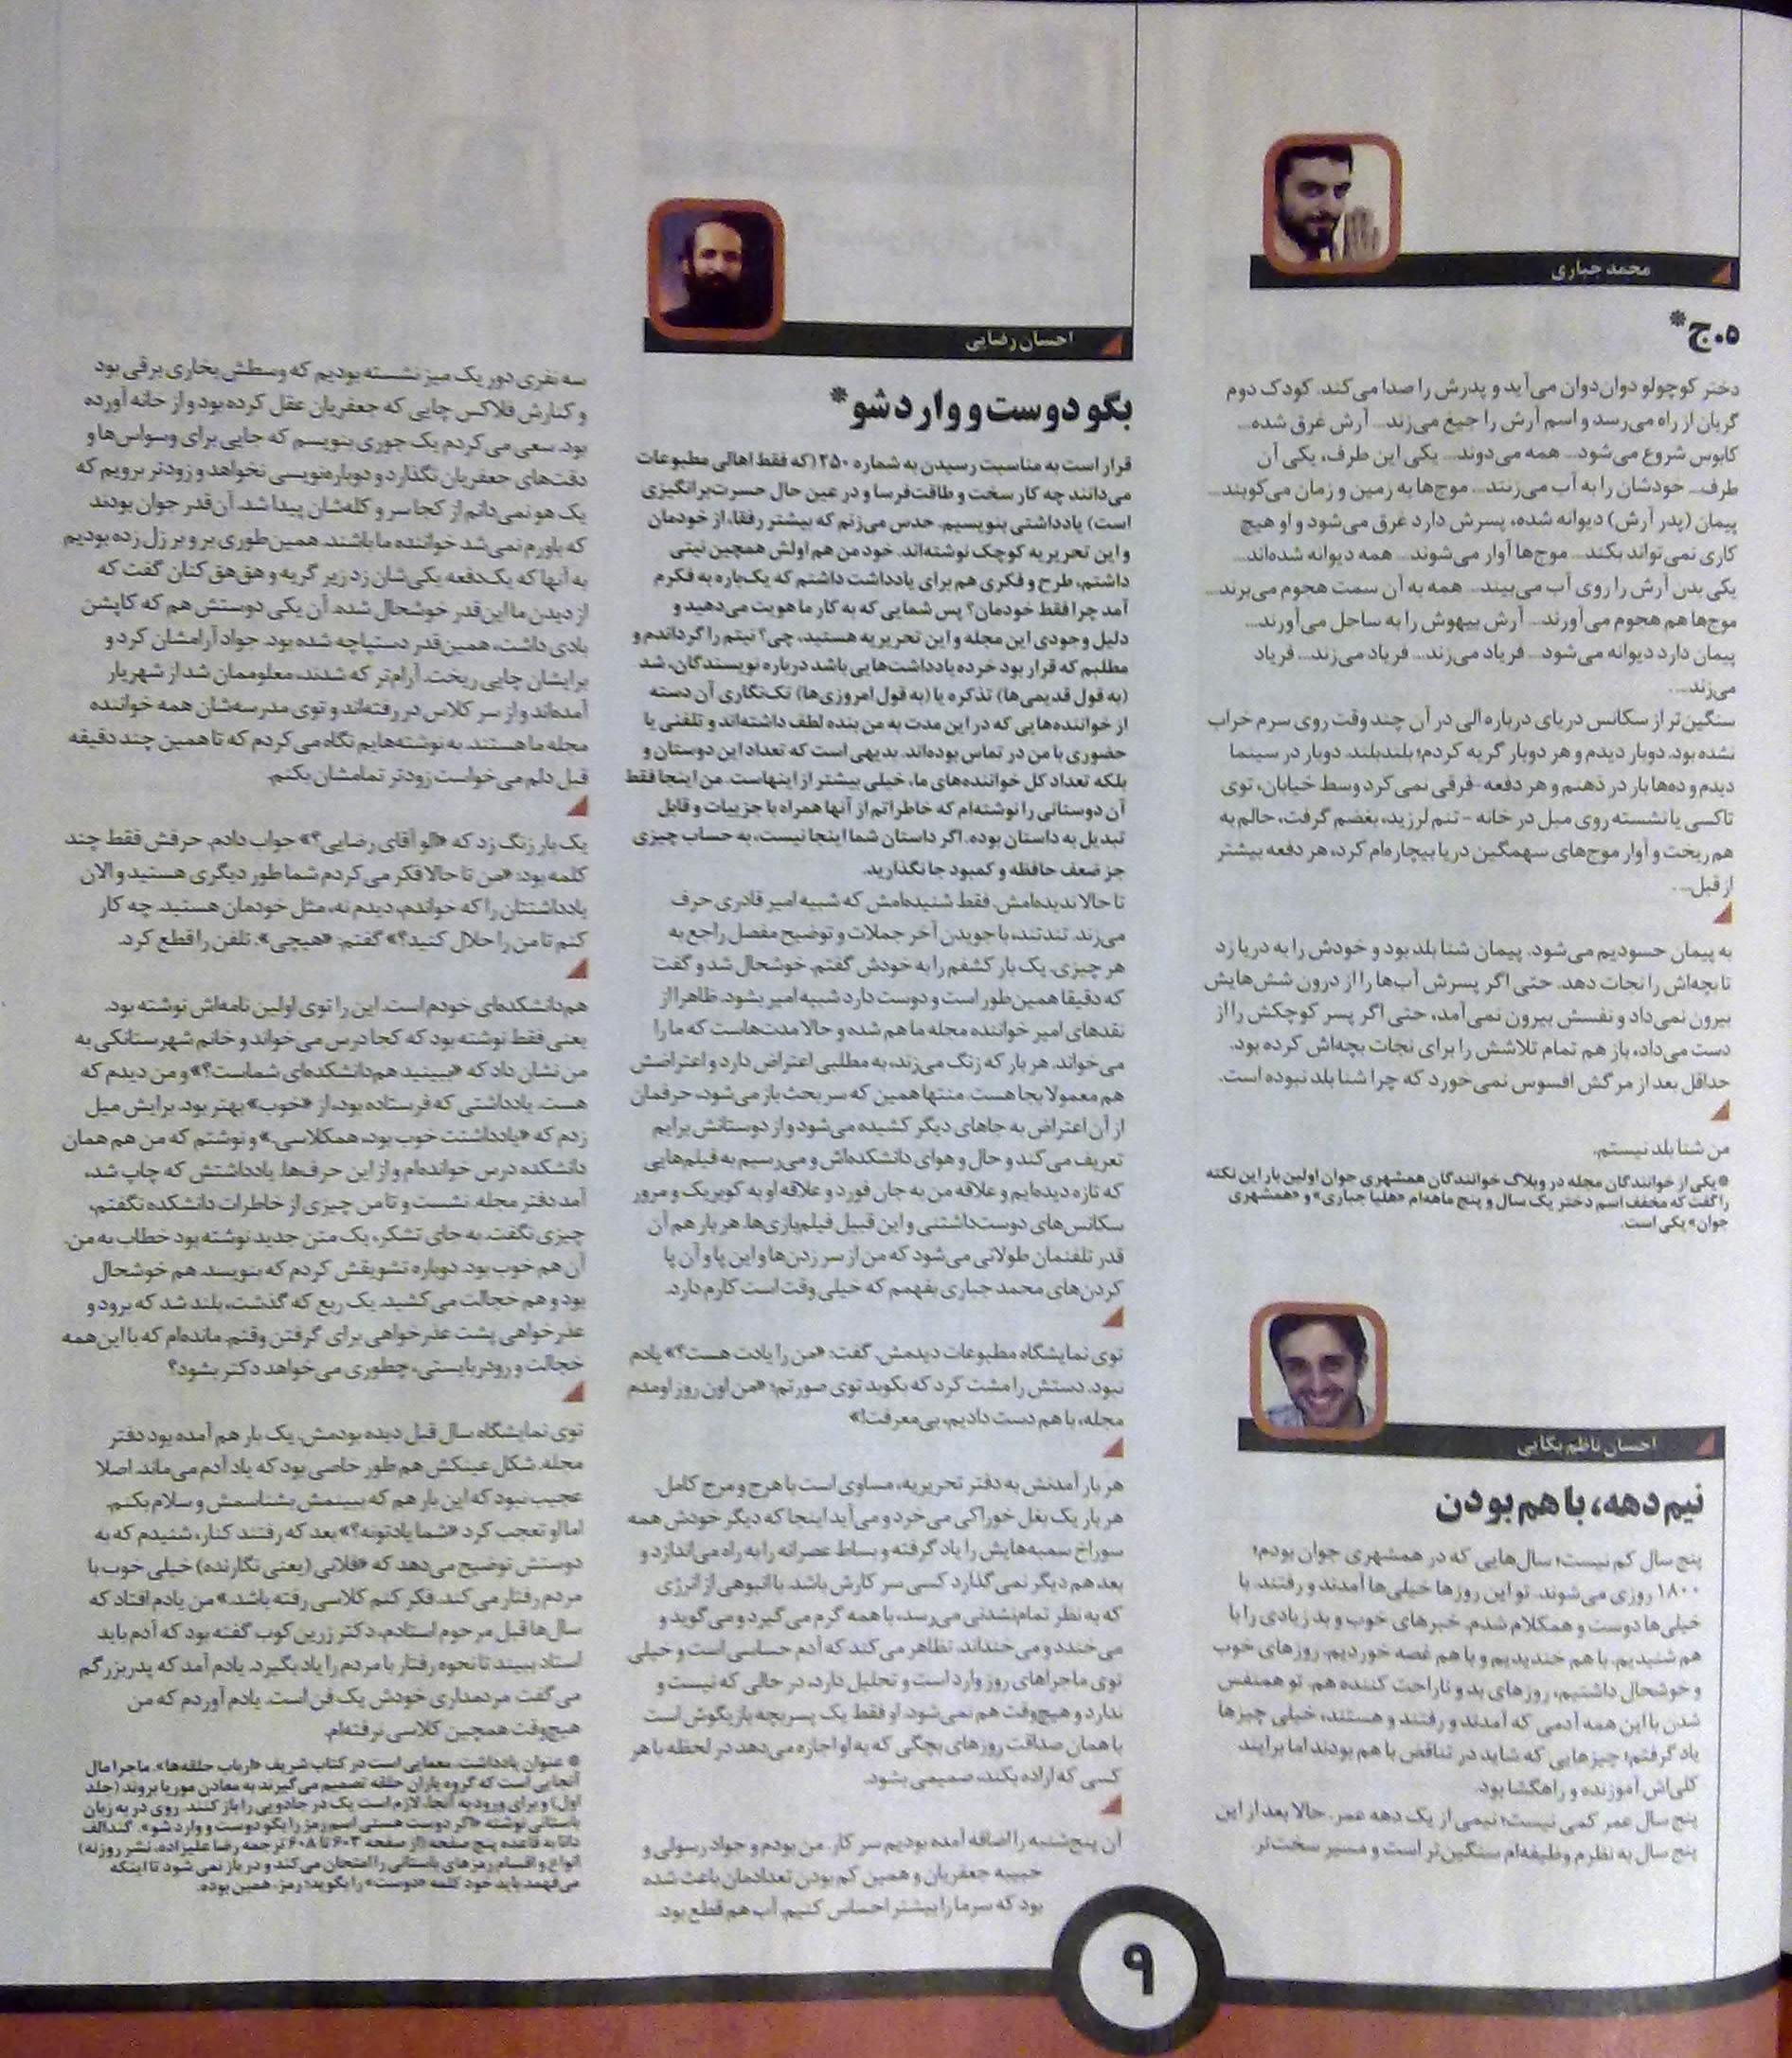 http://hadihossein.persiangig.com/image/20100214081.jpg